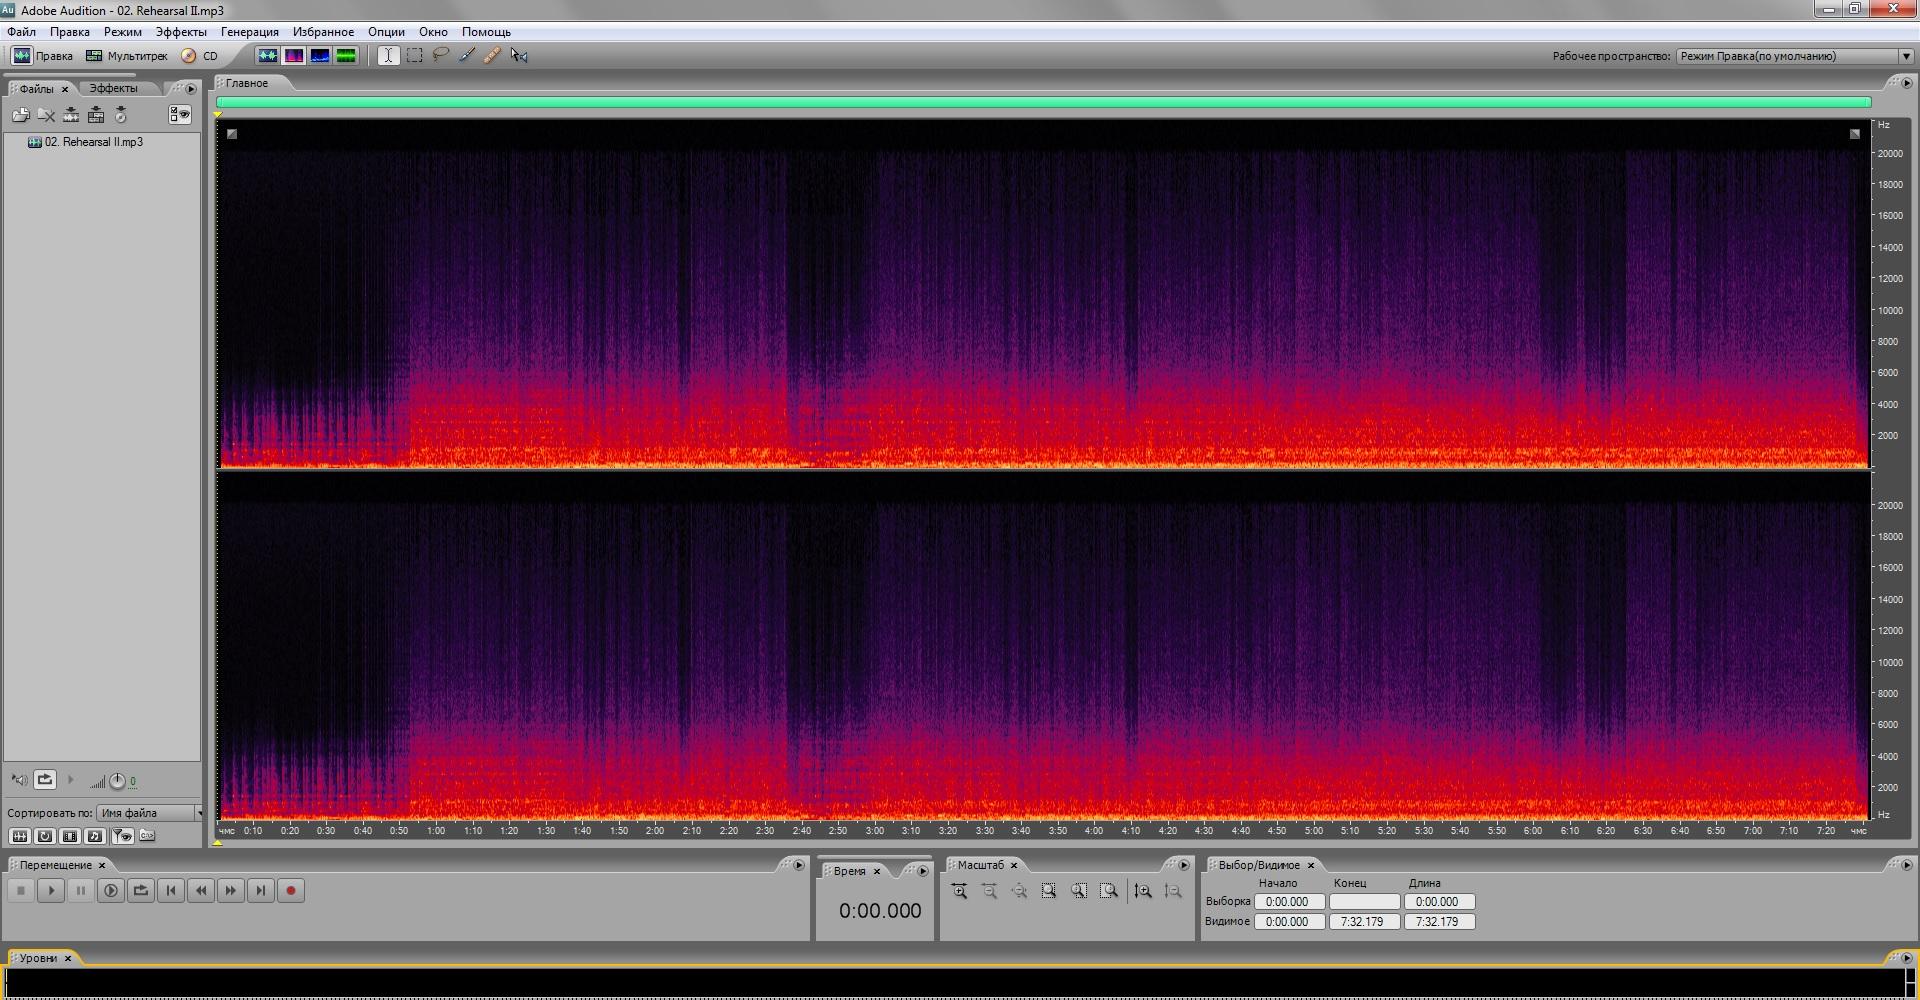 spektr2.jpg